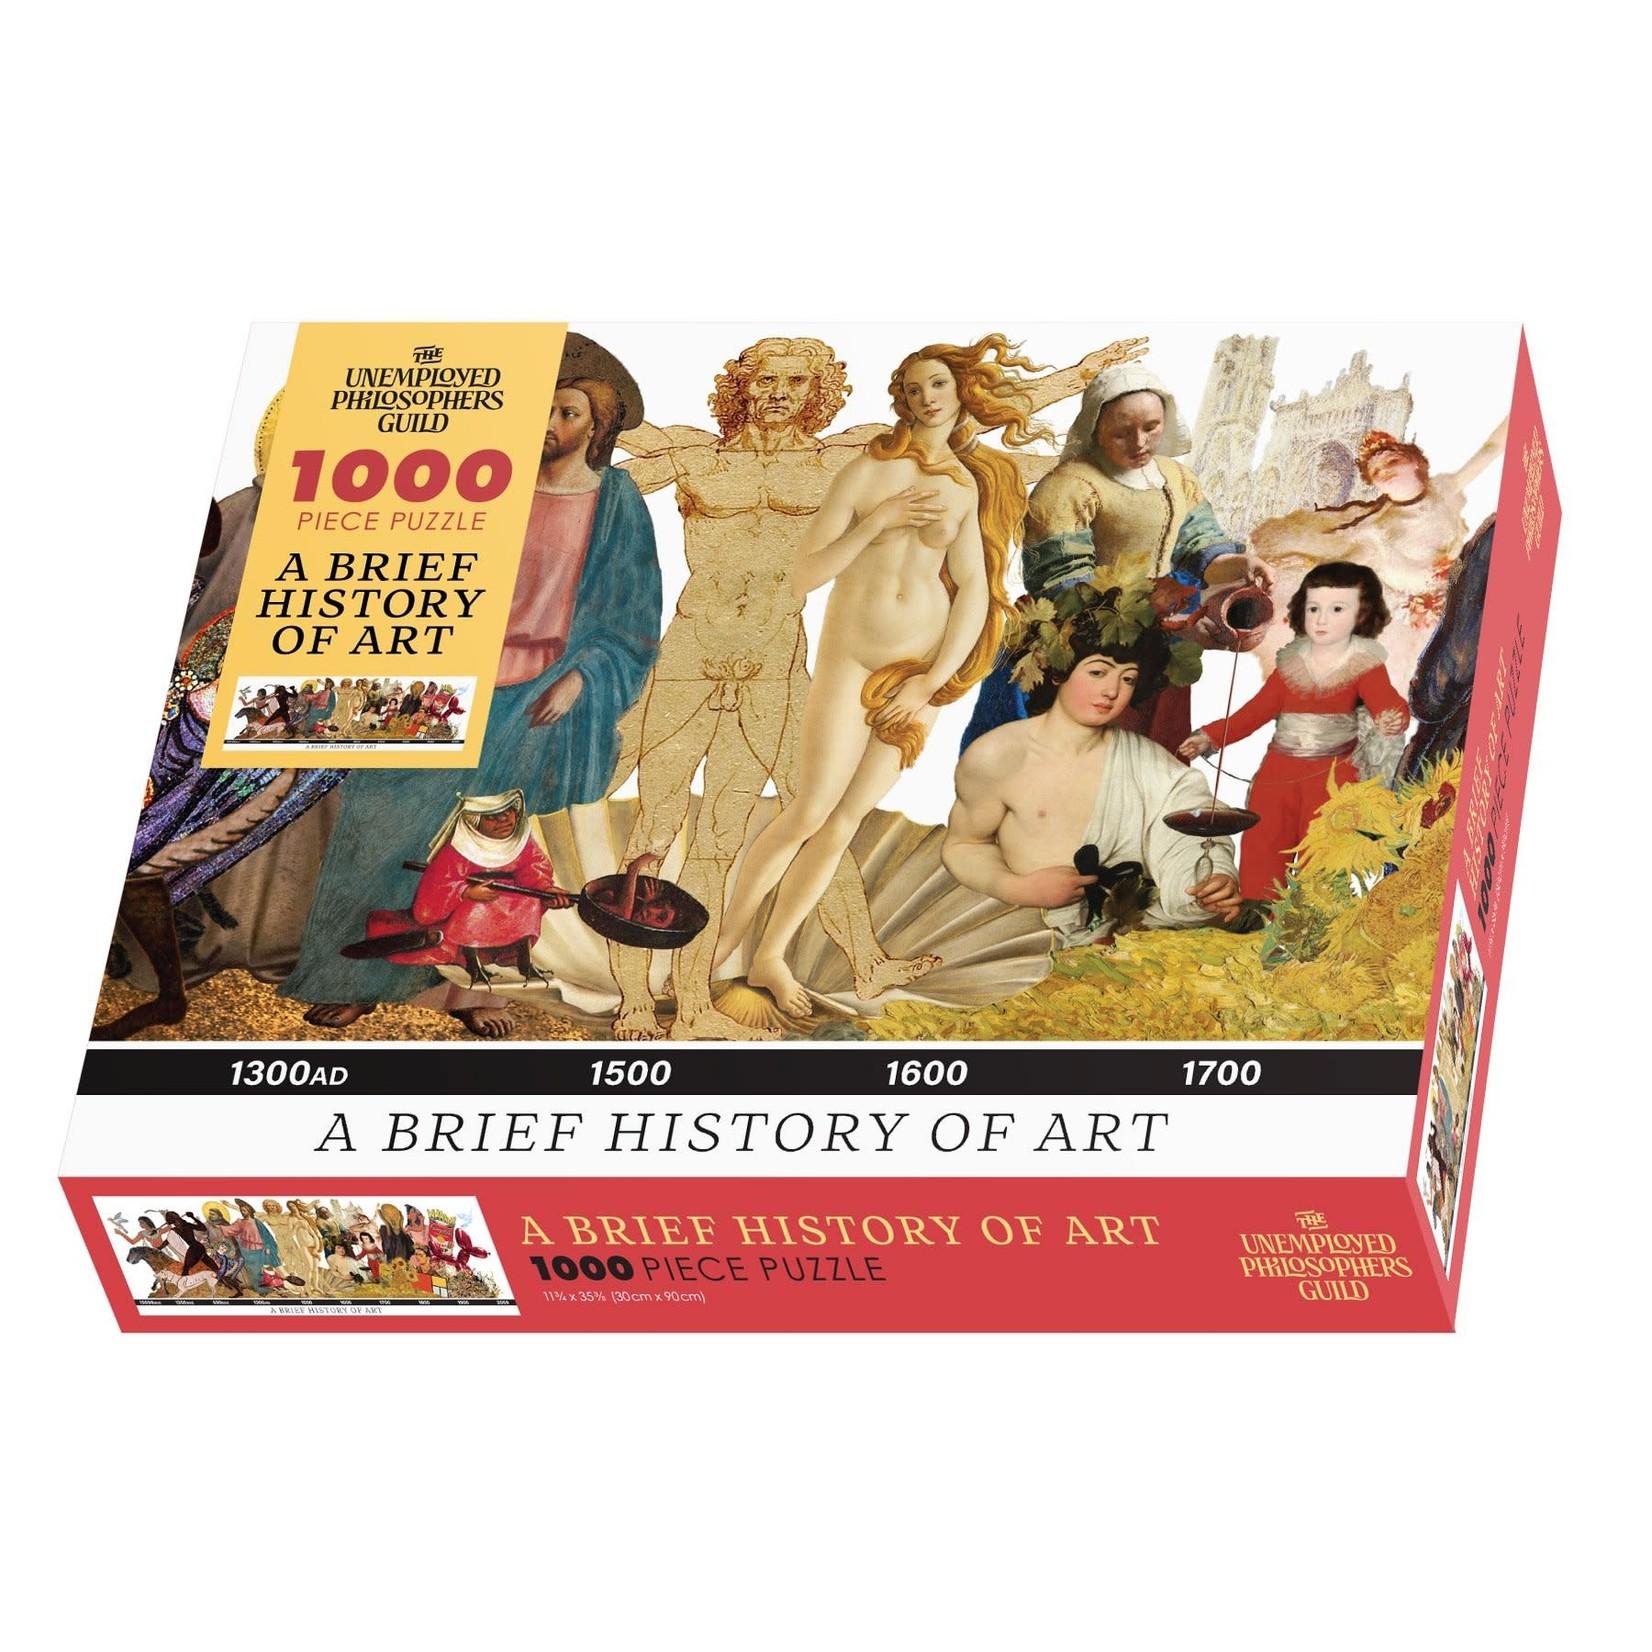 A Brief History of Art Puzzle (1000 pieces)